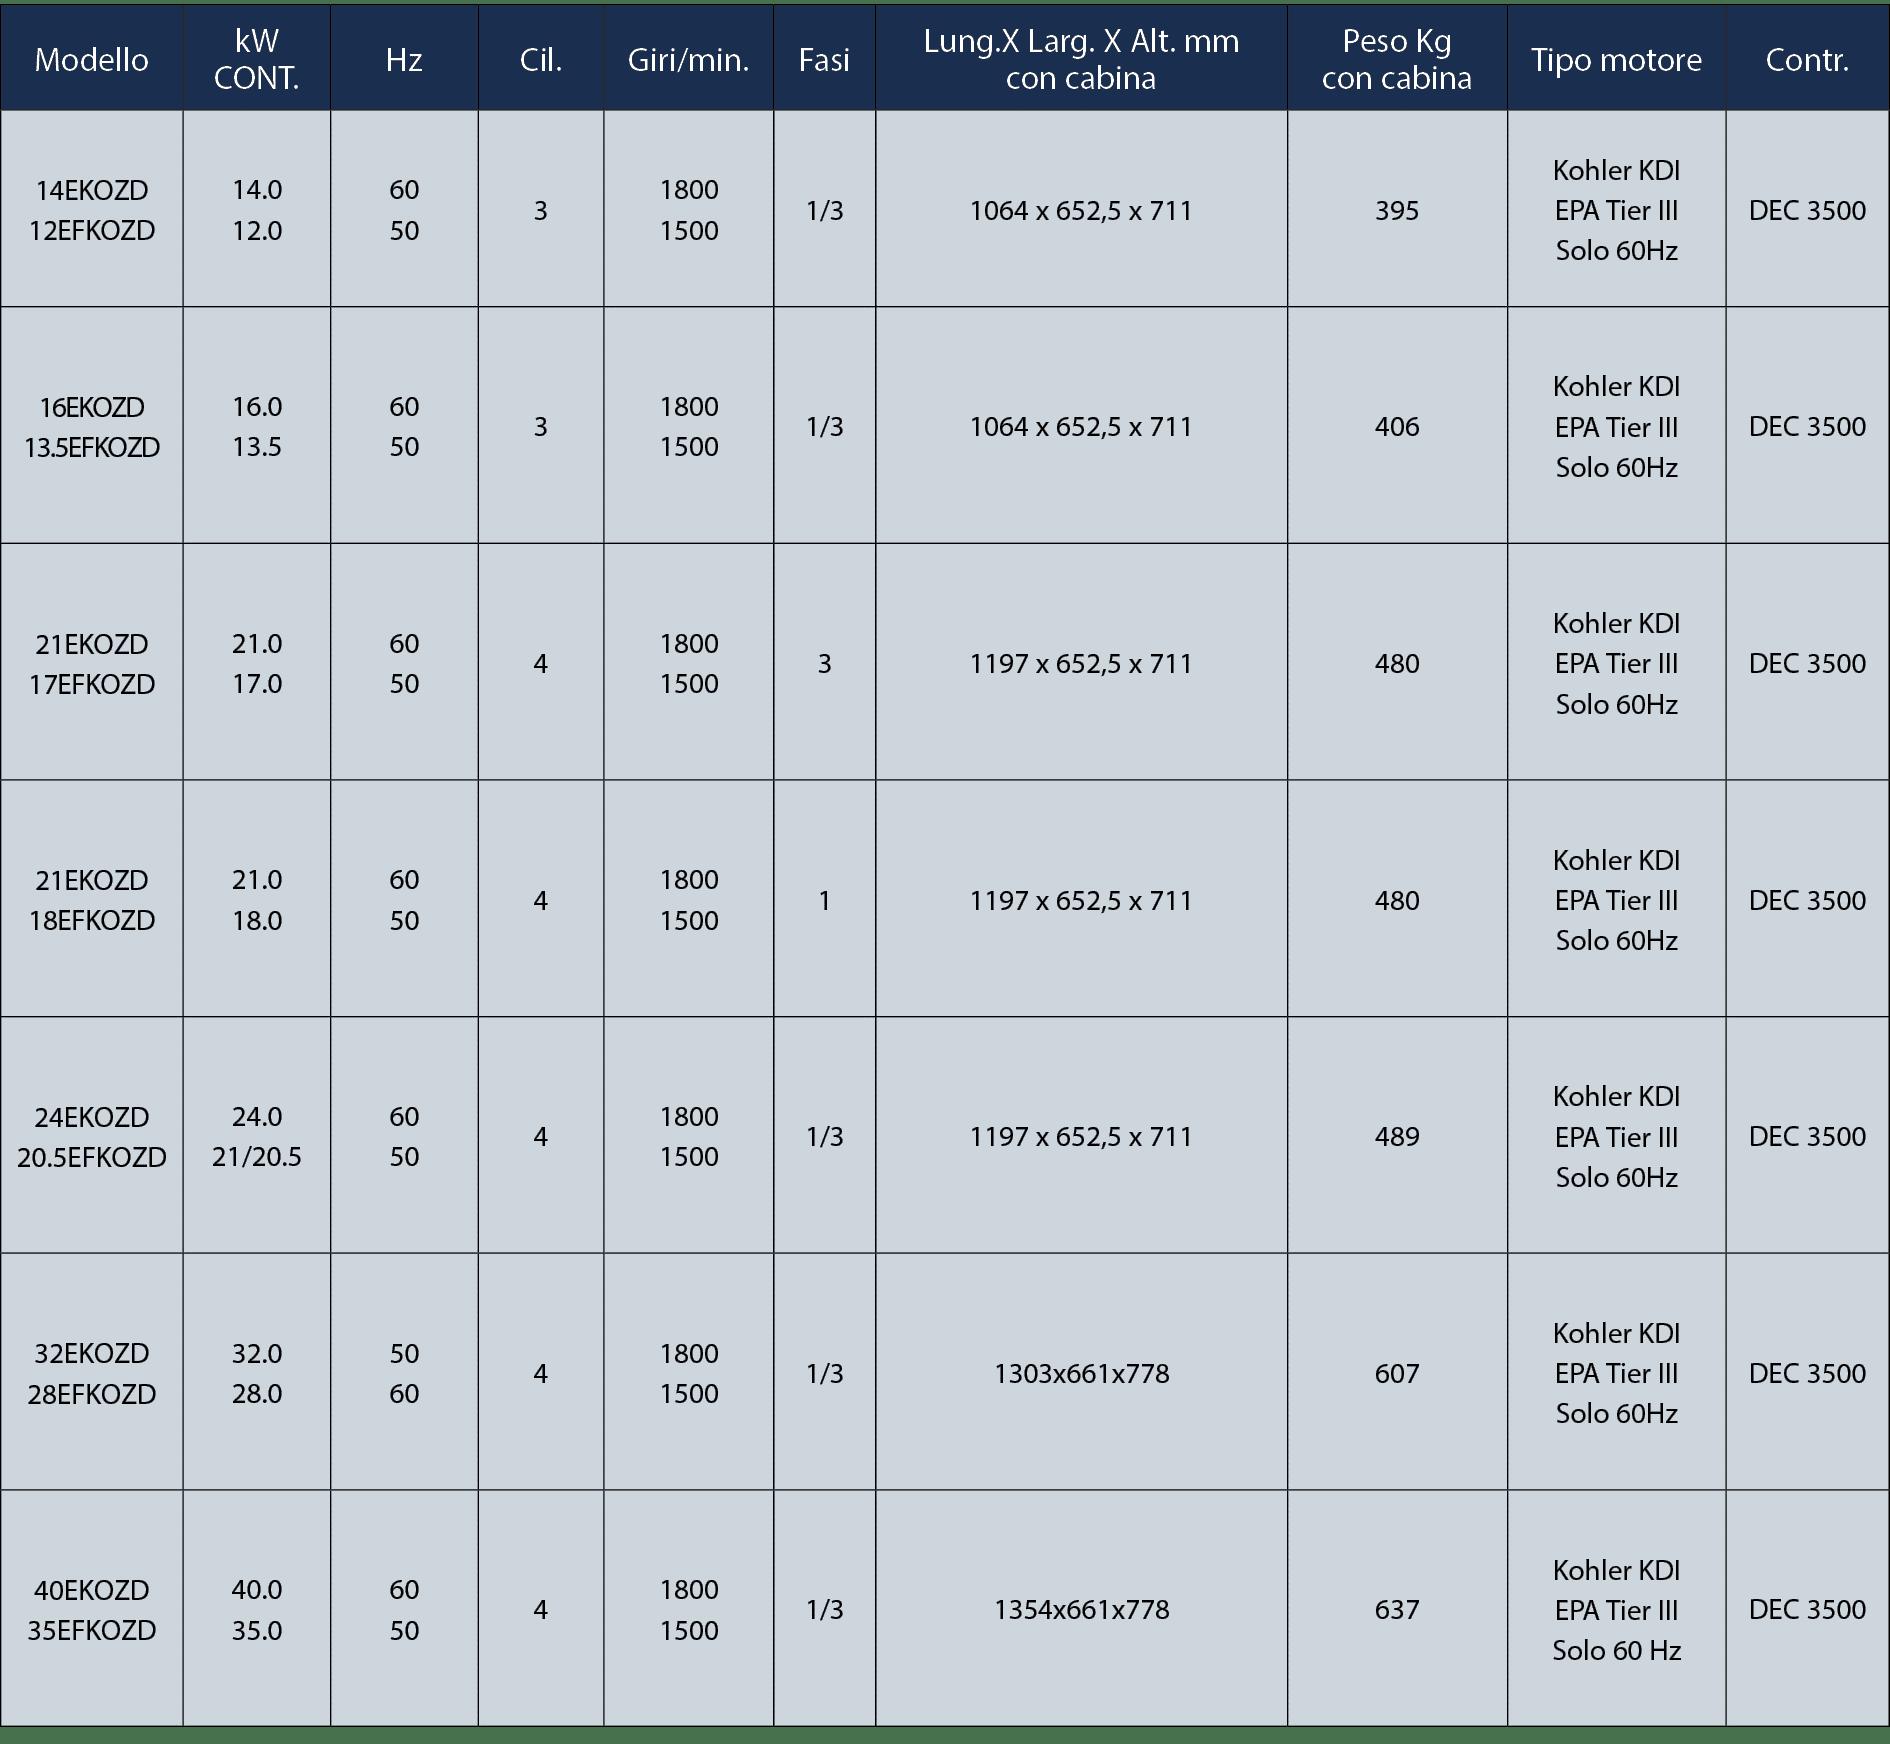 Gruppi elettronici diesel